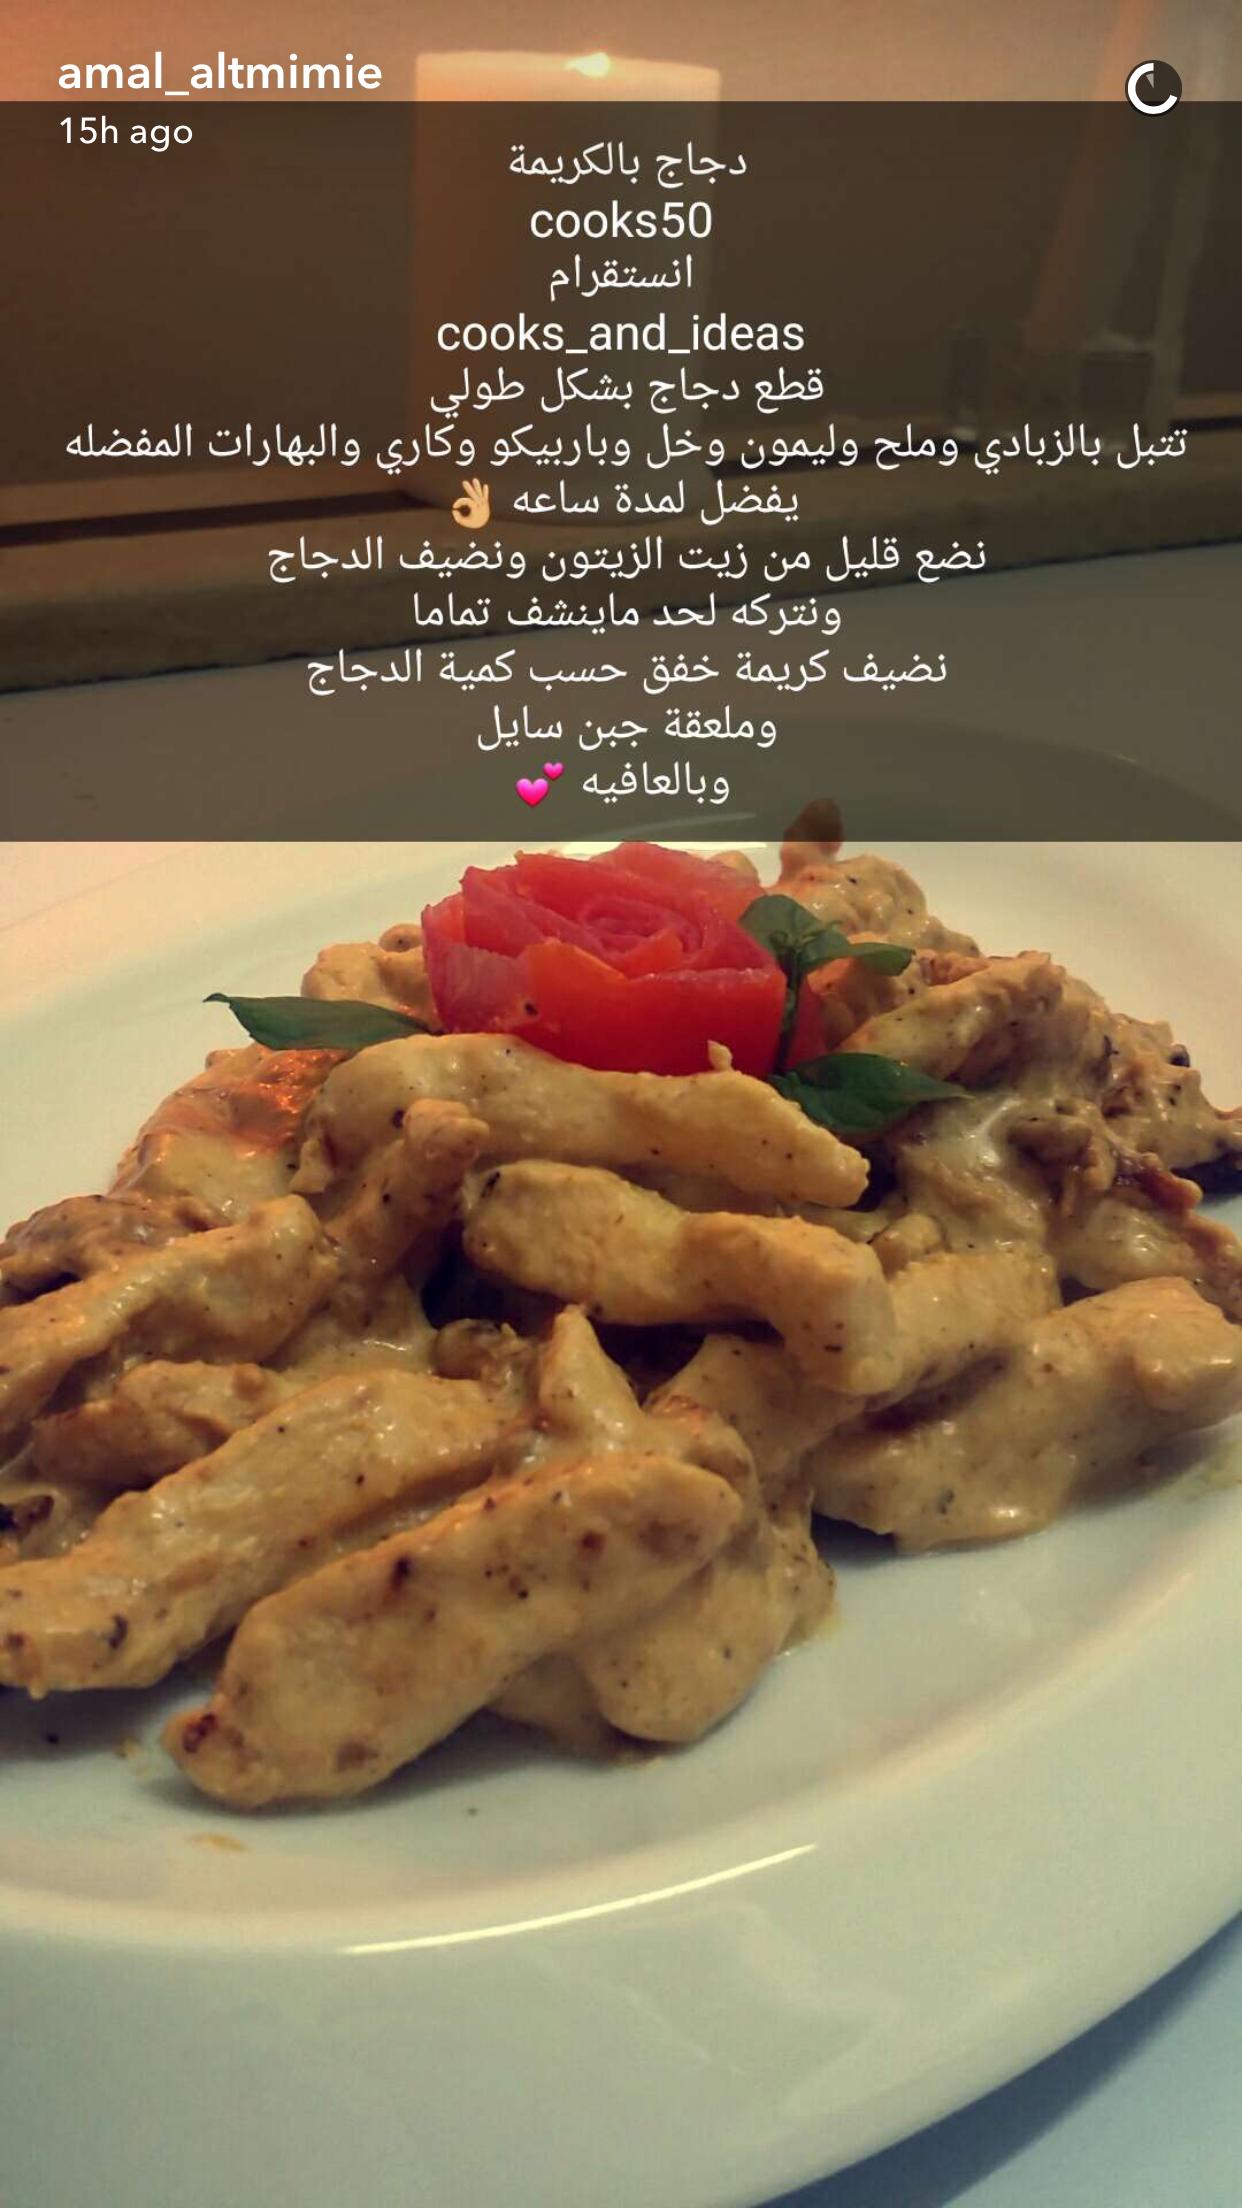 دجاج بالكريمة Food Dishes Egyptian Food Food Receipes